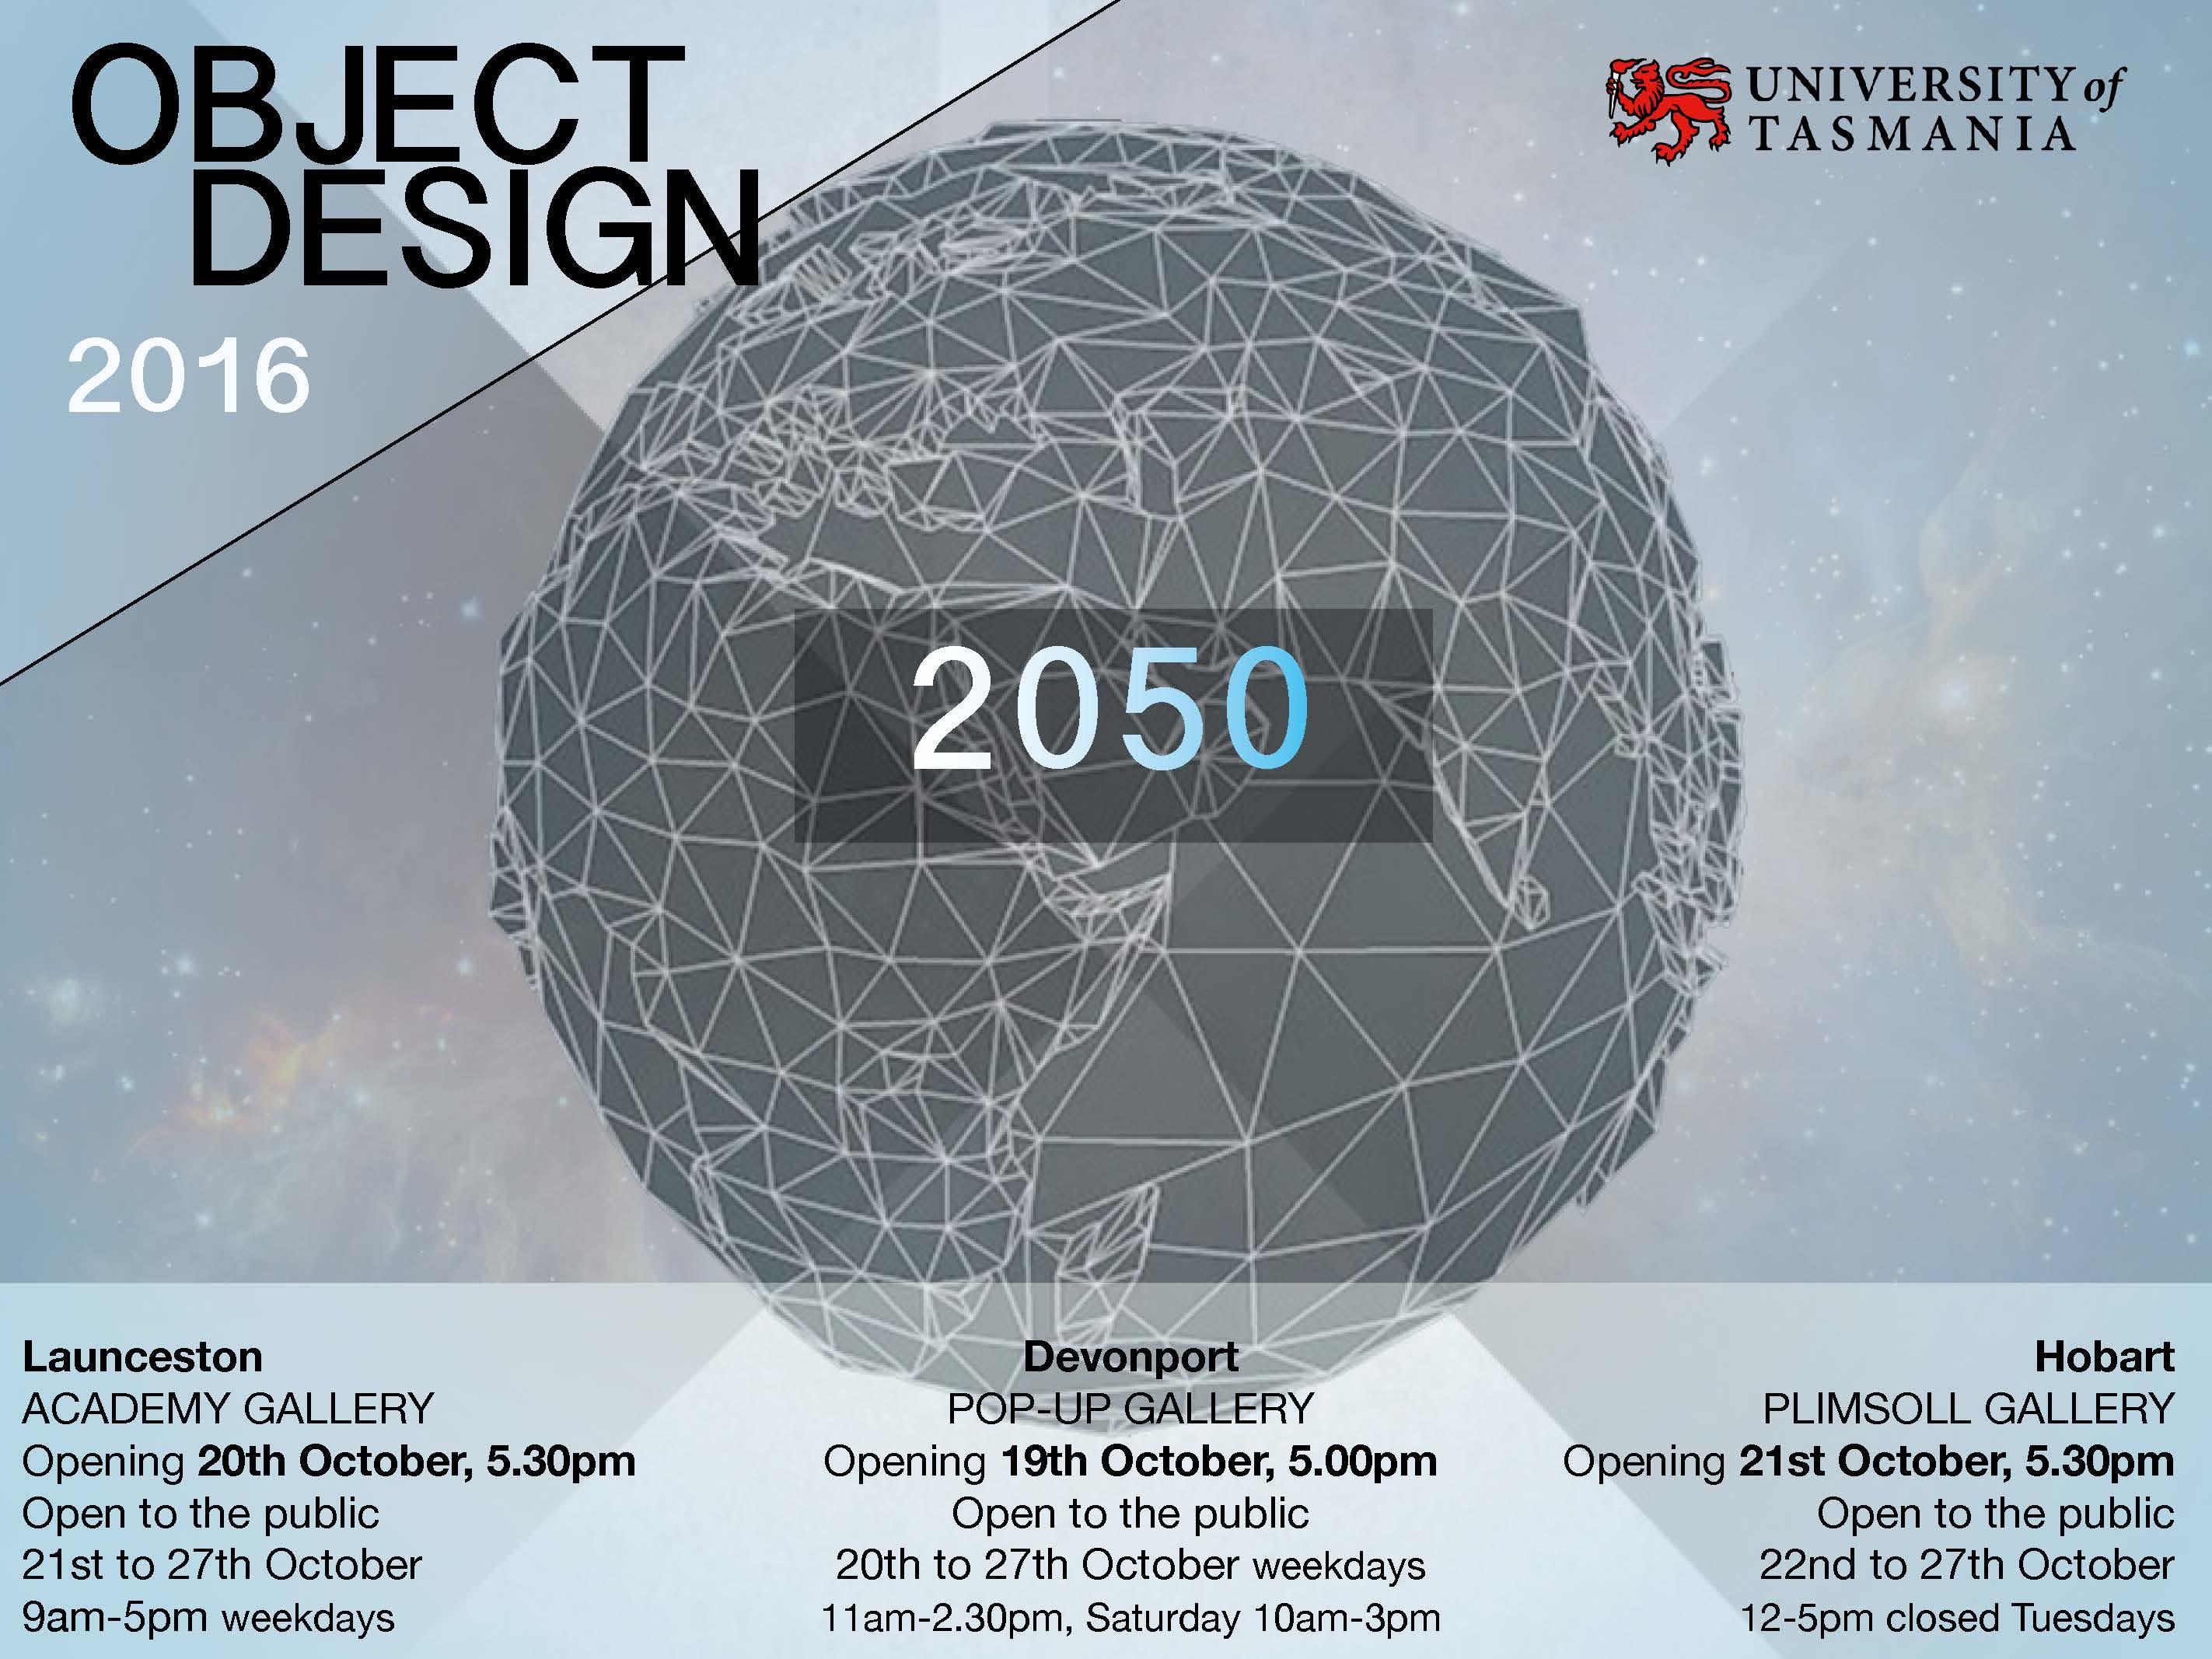 Object Design 2050